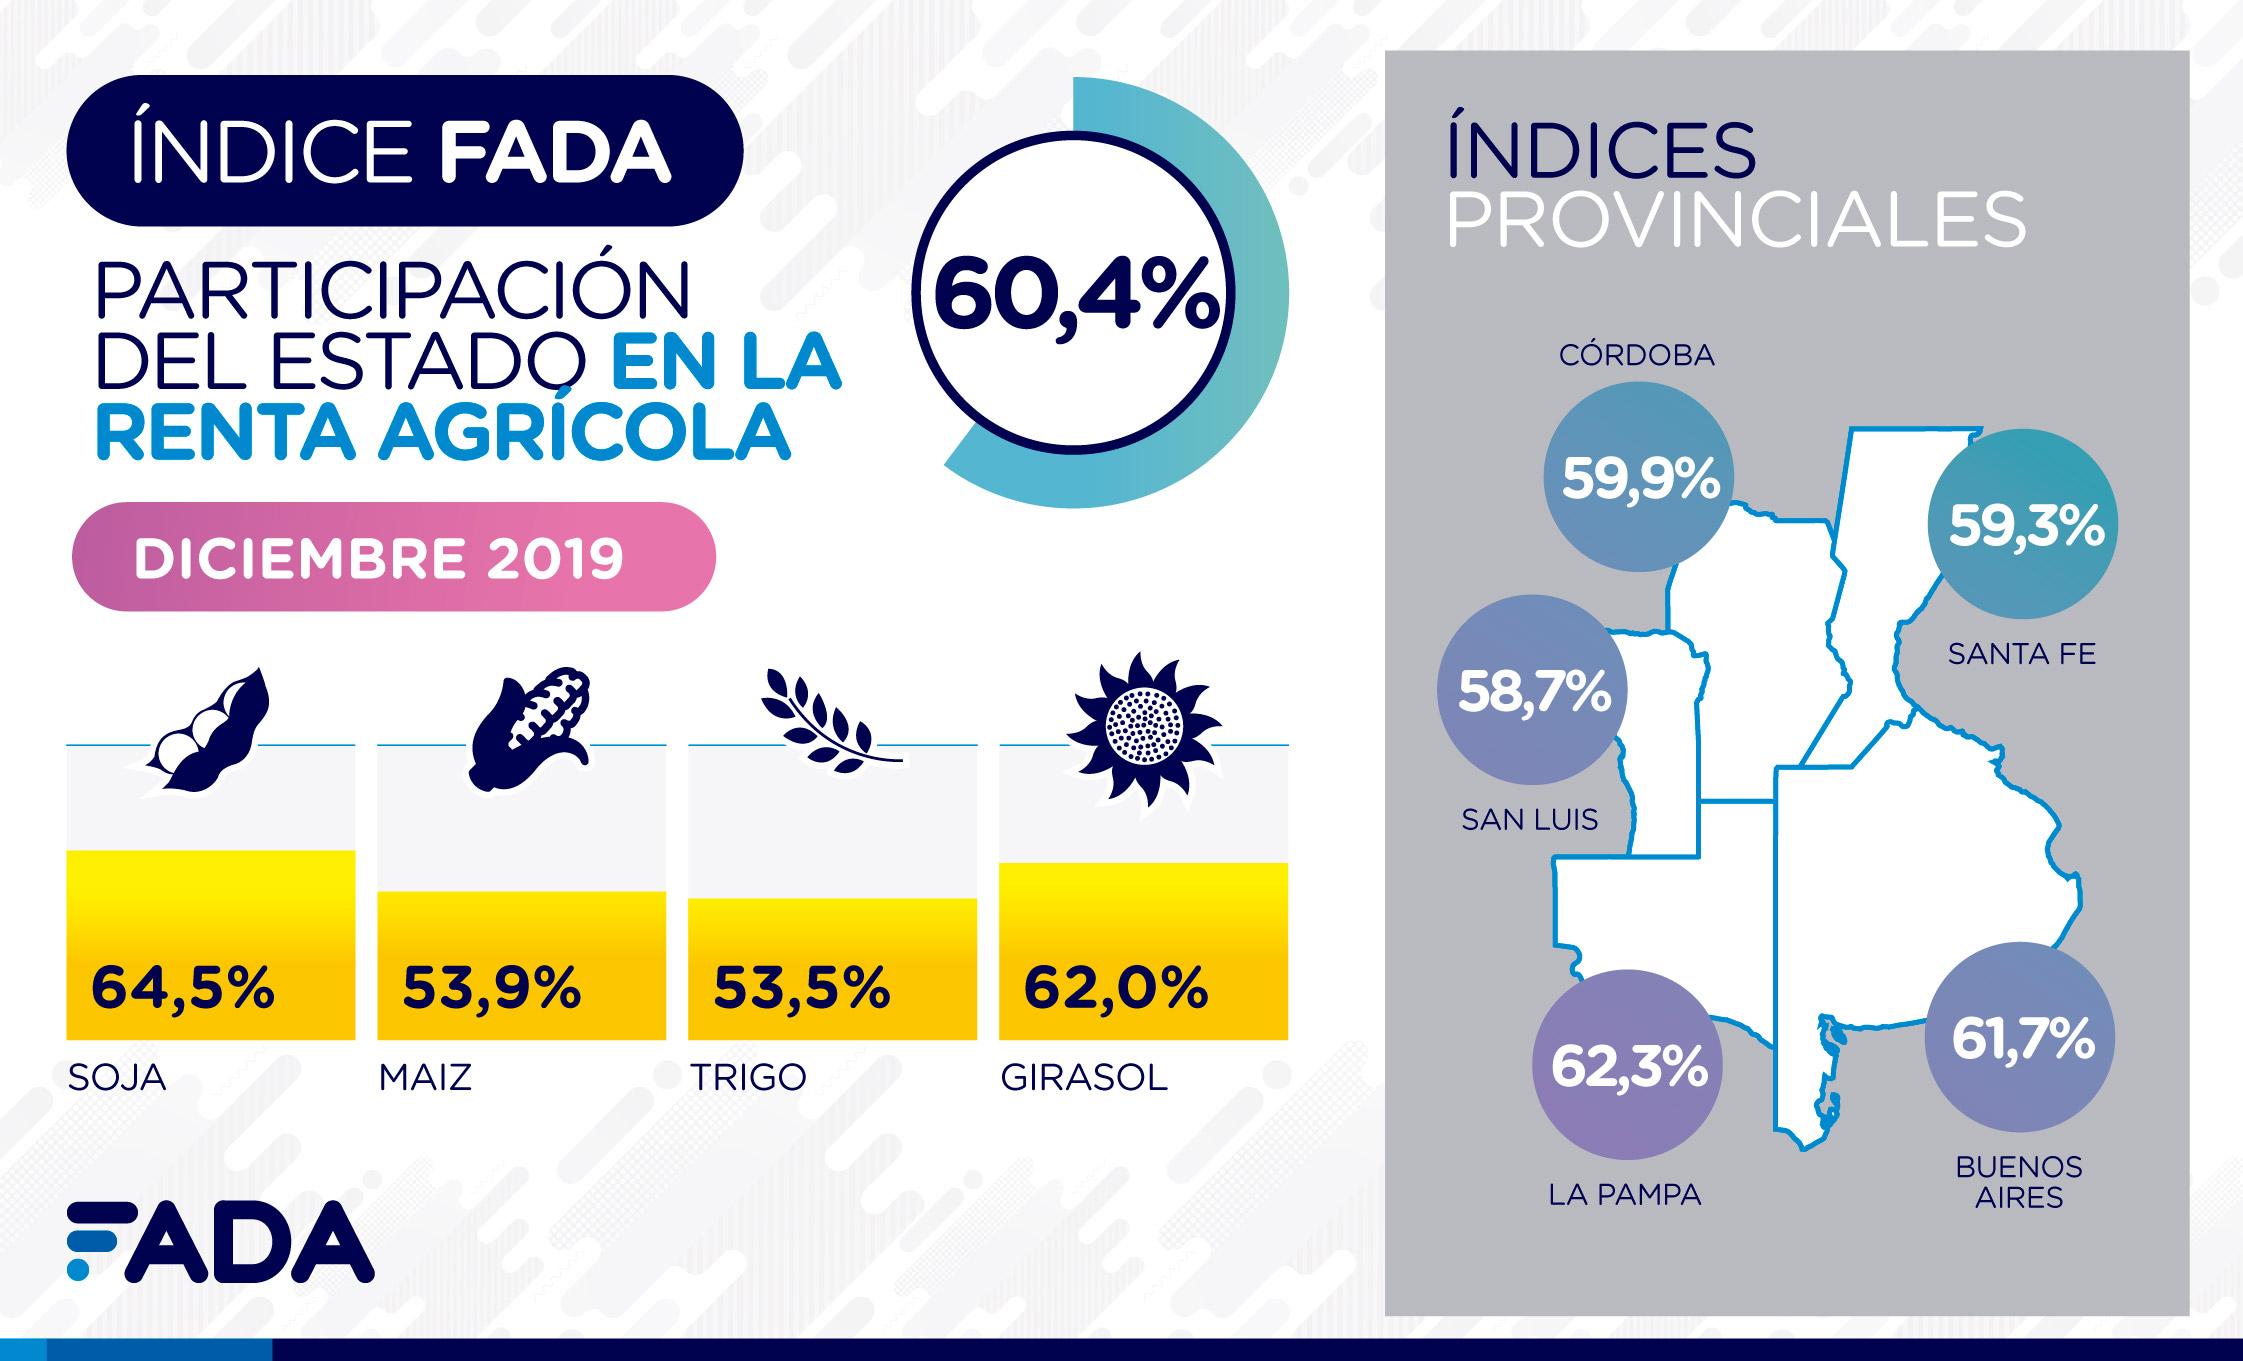 índice FADA Diciembre 2019: 60,4%